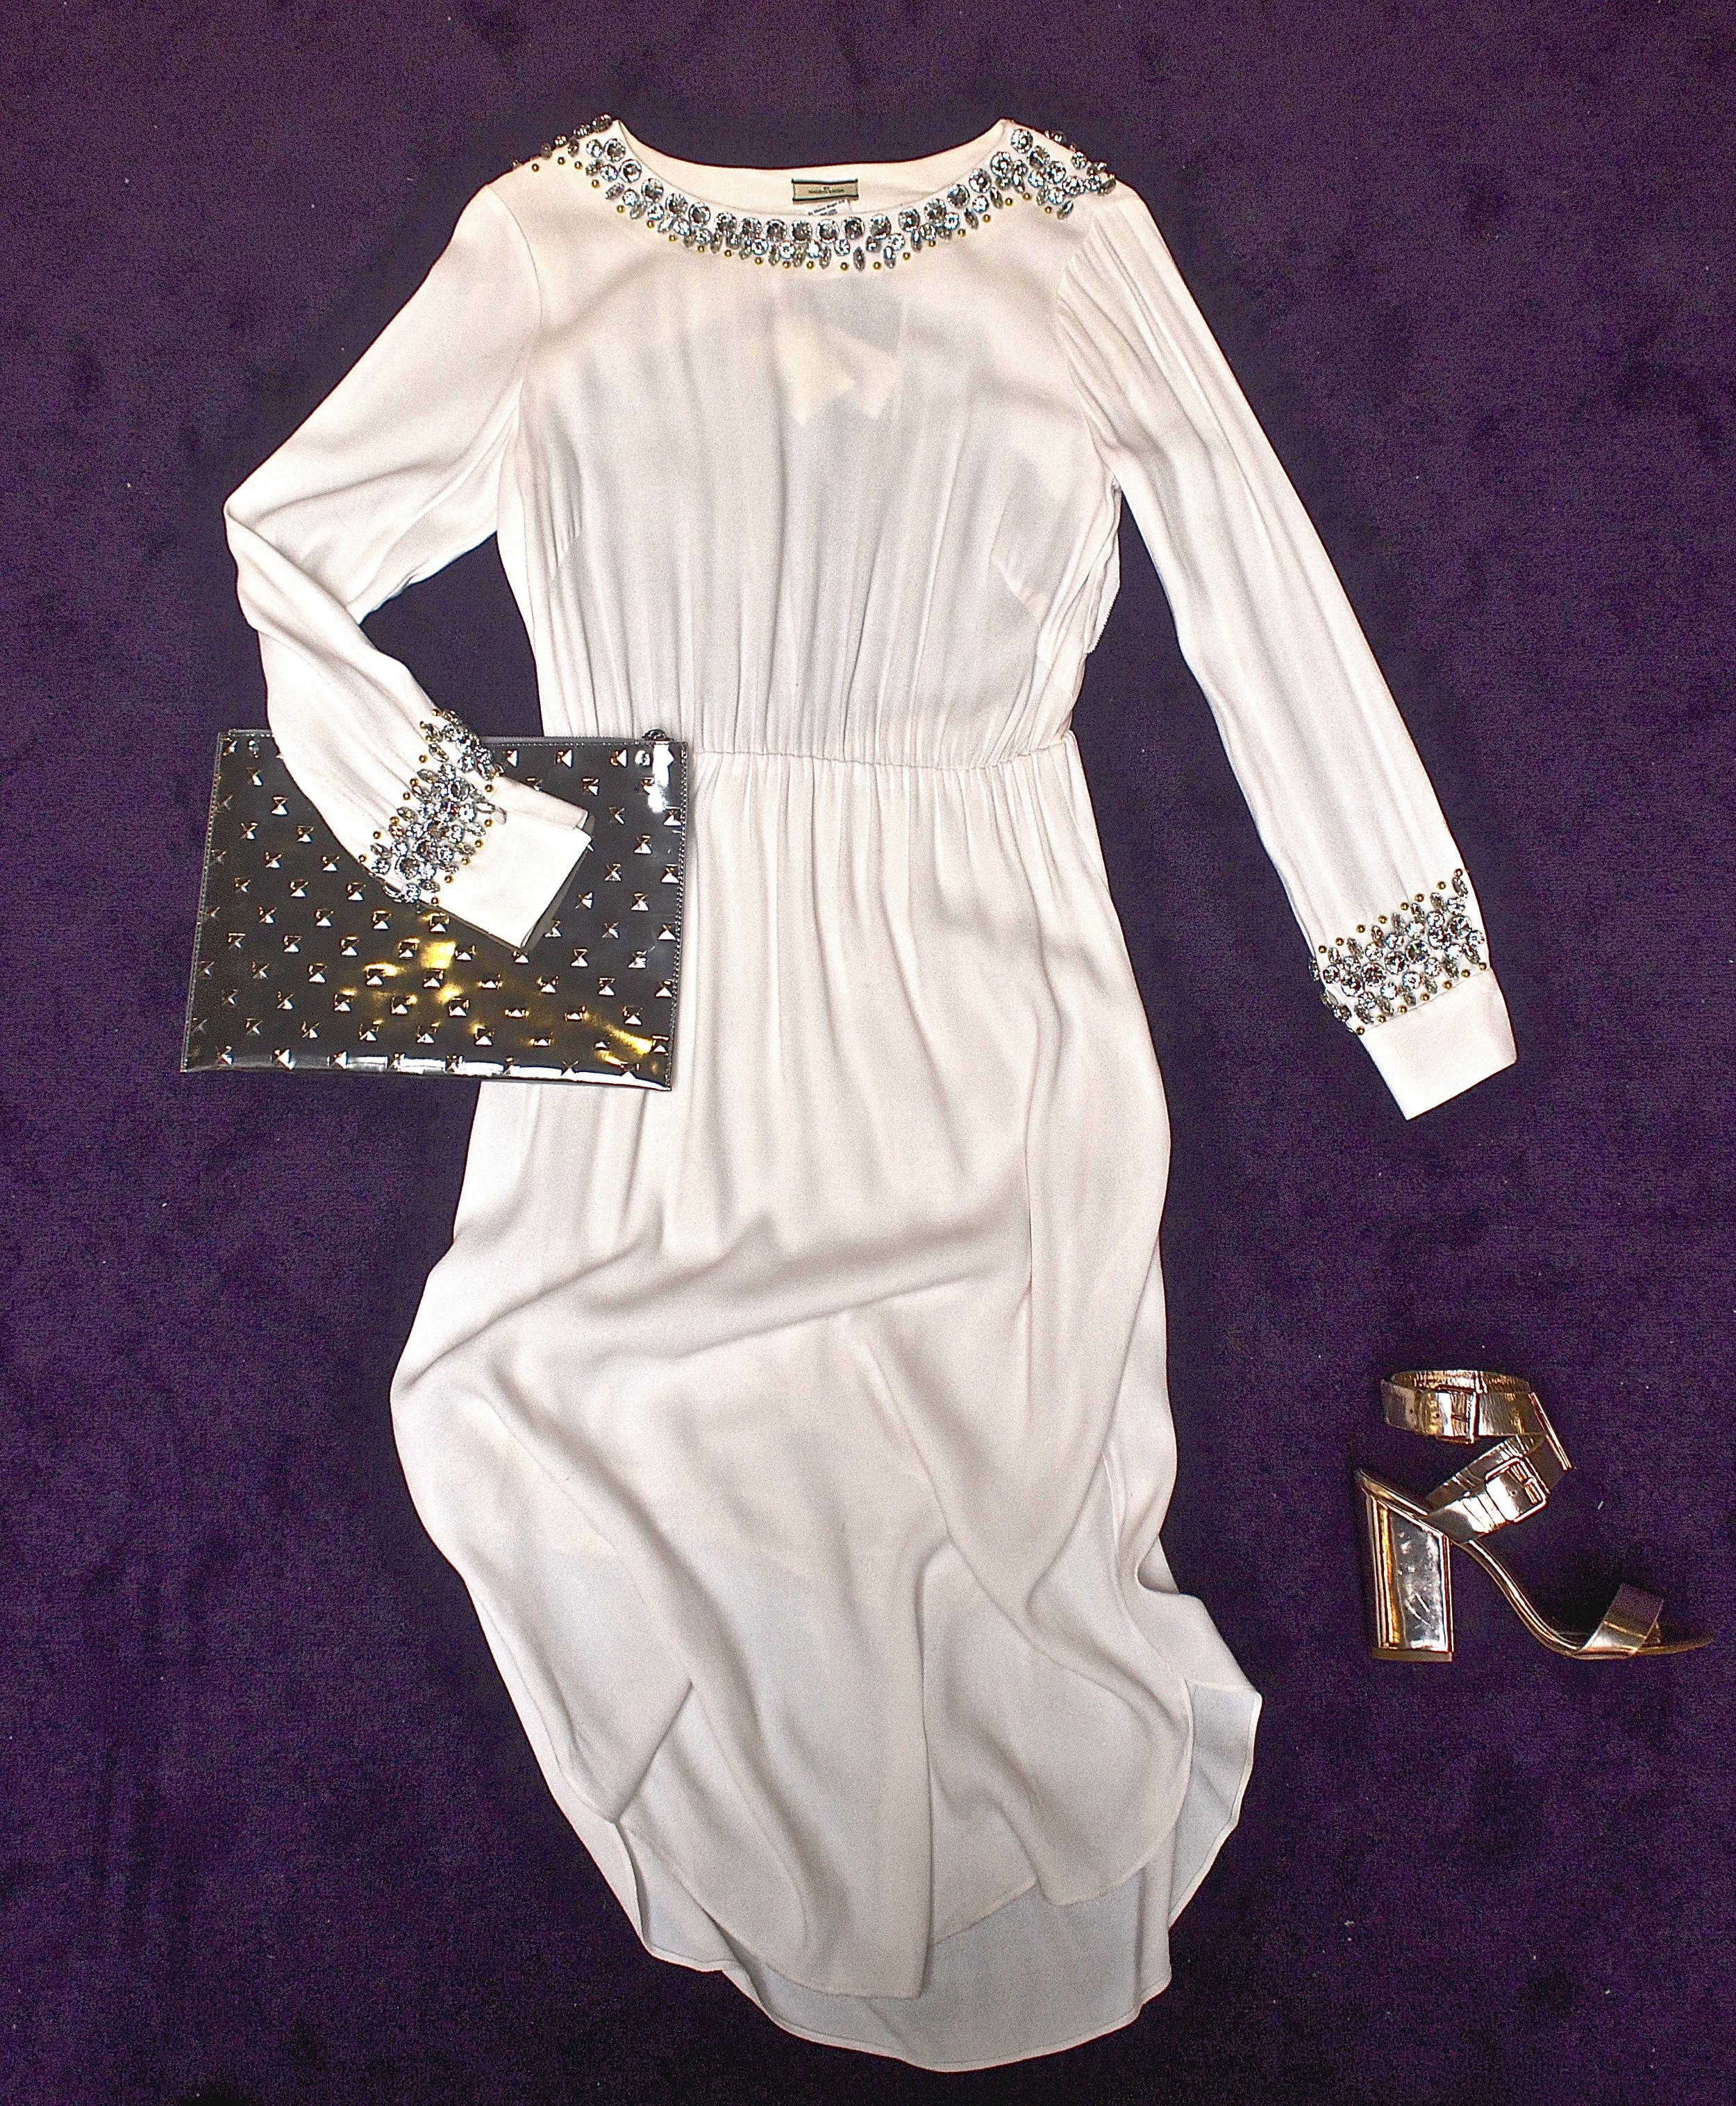 Malene Birger - Livisia Dress $895, Ela - Editors's Studded Pouch Silver $218, Ted Baker - Lissom Shoe Rose Gold $298